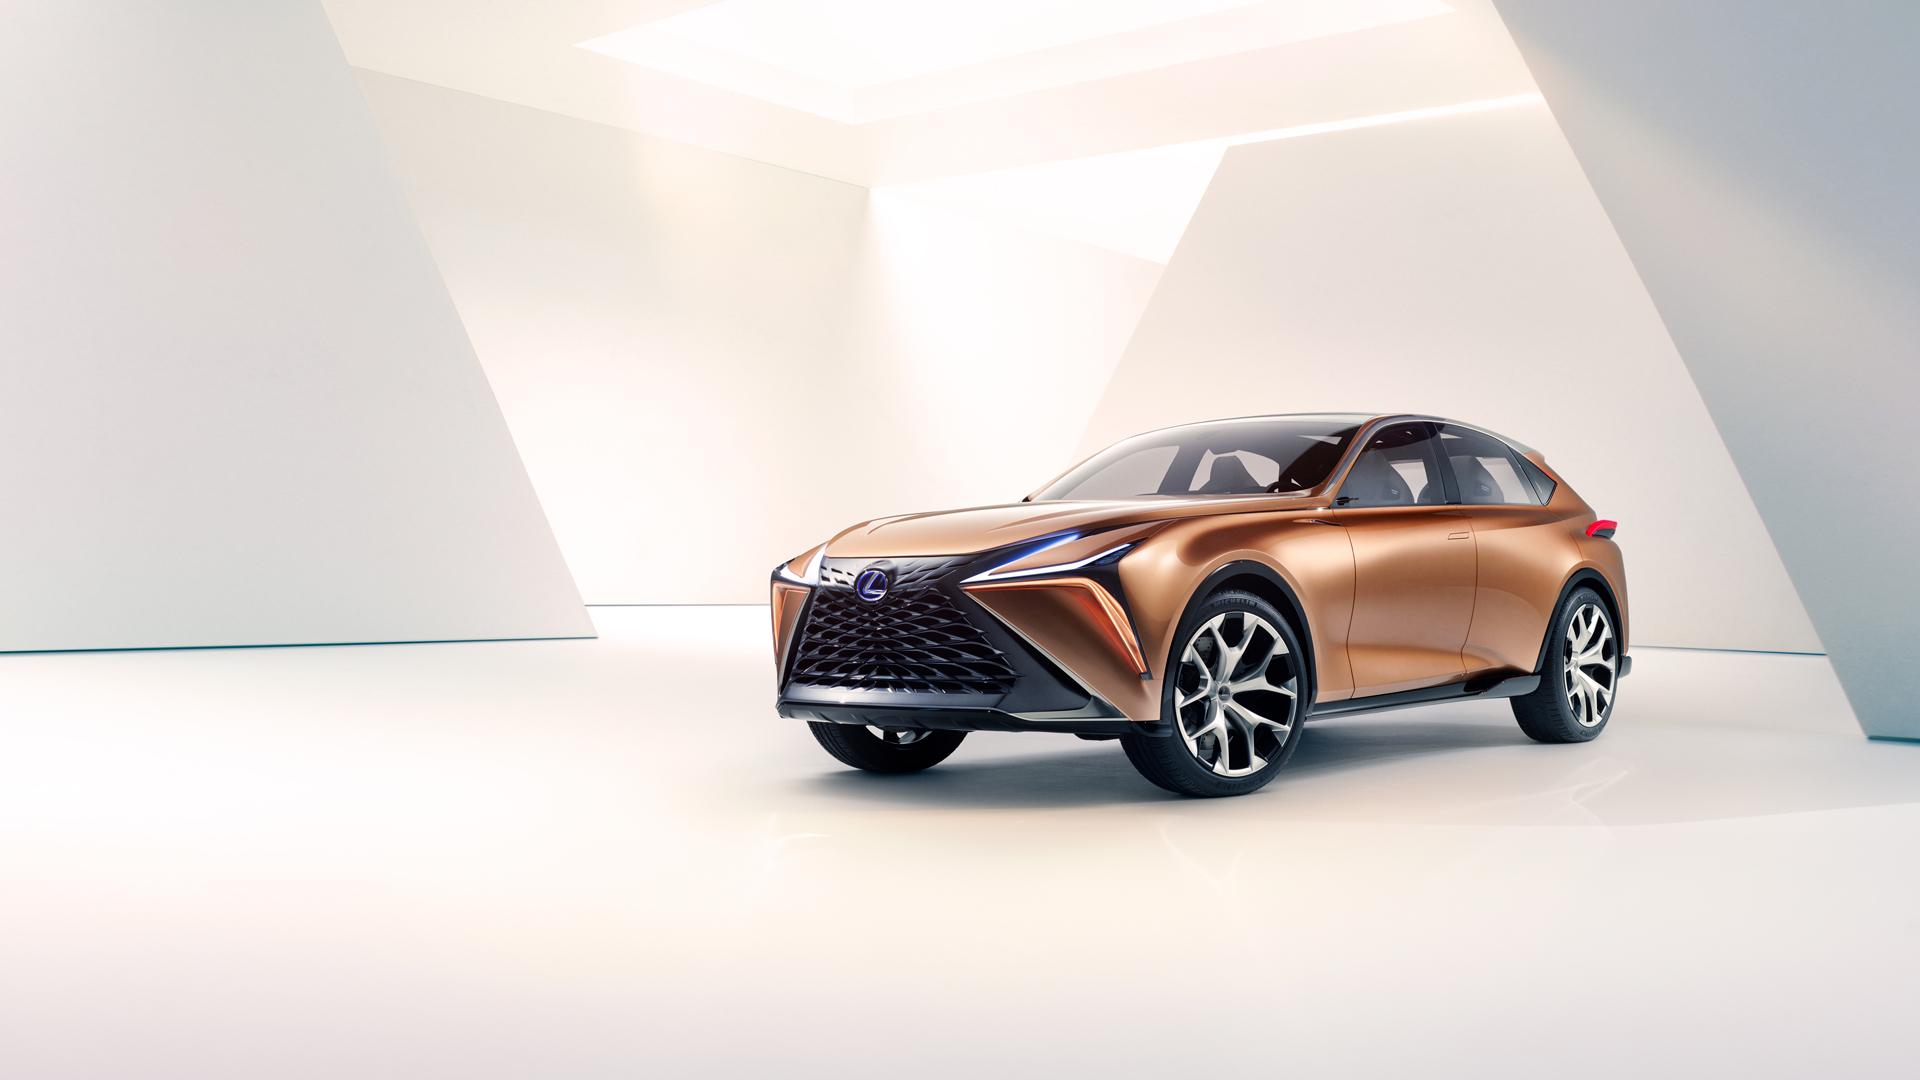 Lexus presenta el LF 1 Limitless hero asset